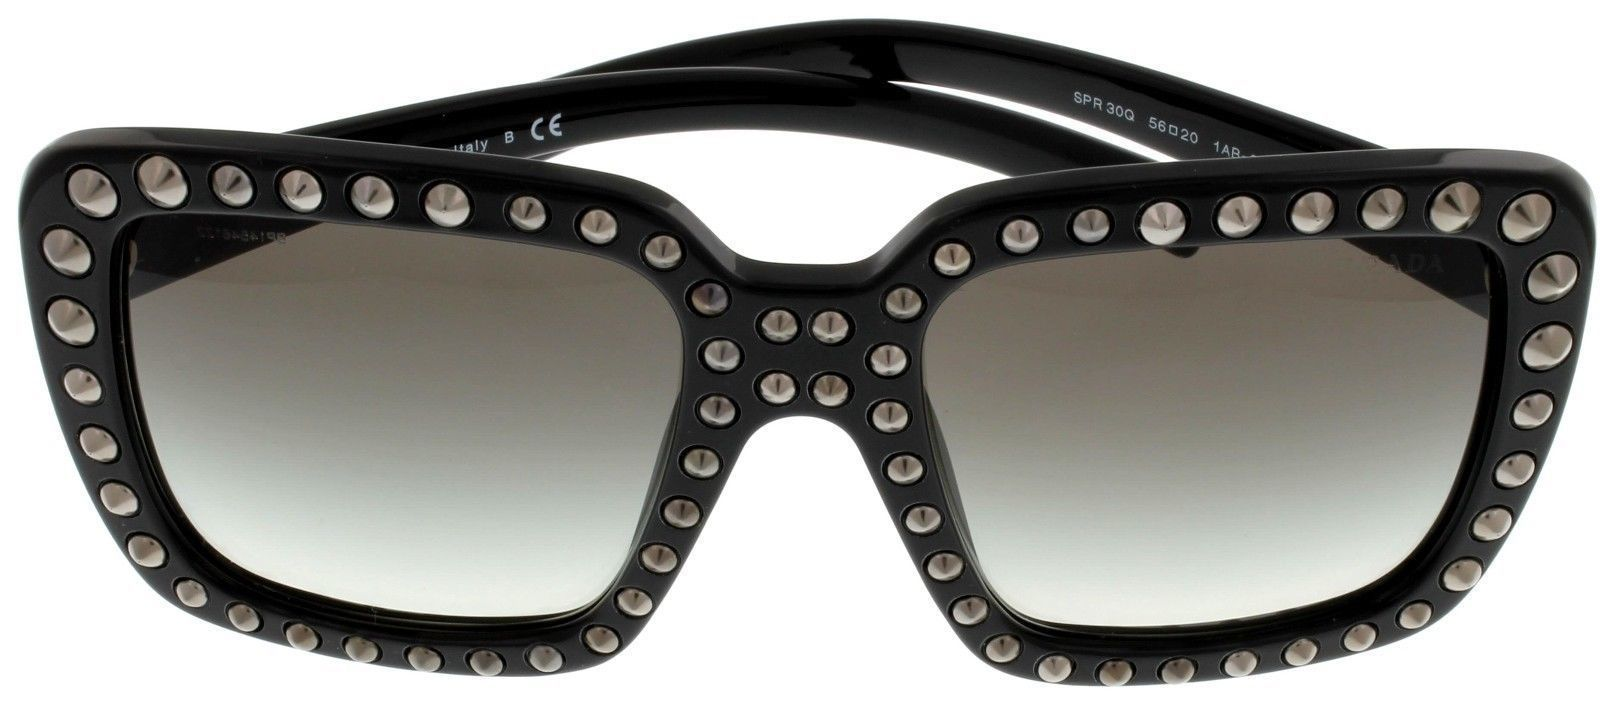 Prada Sunglasses Women Black Black With Stud Detailing Square PR30QS 1AB0A7